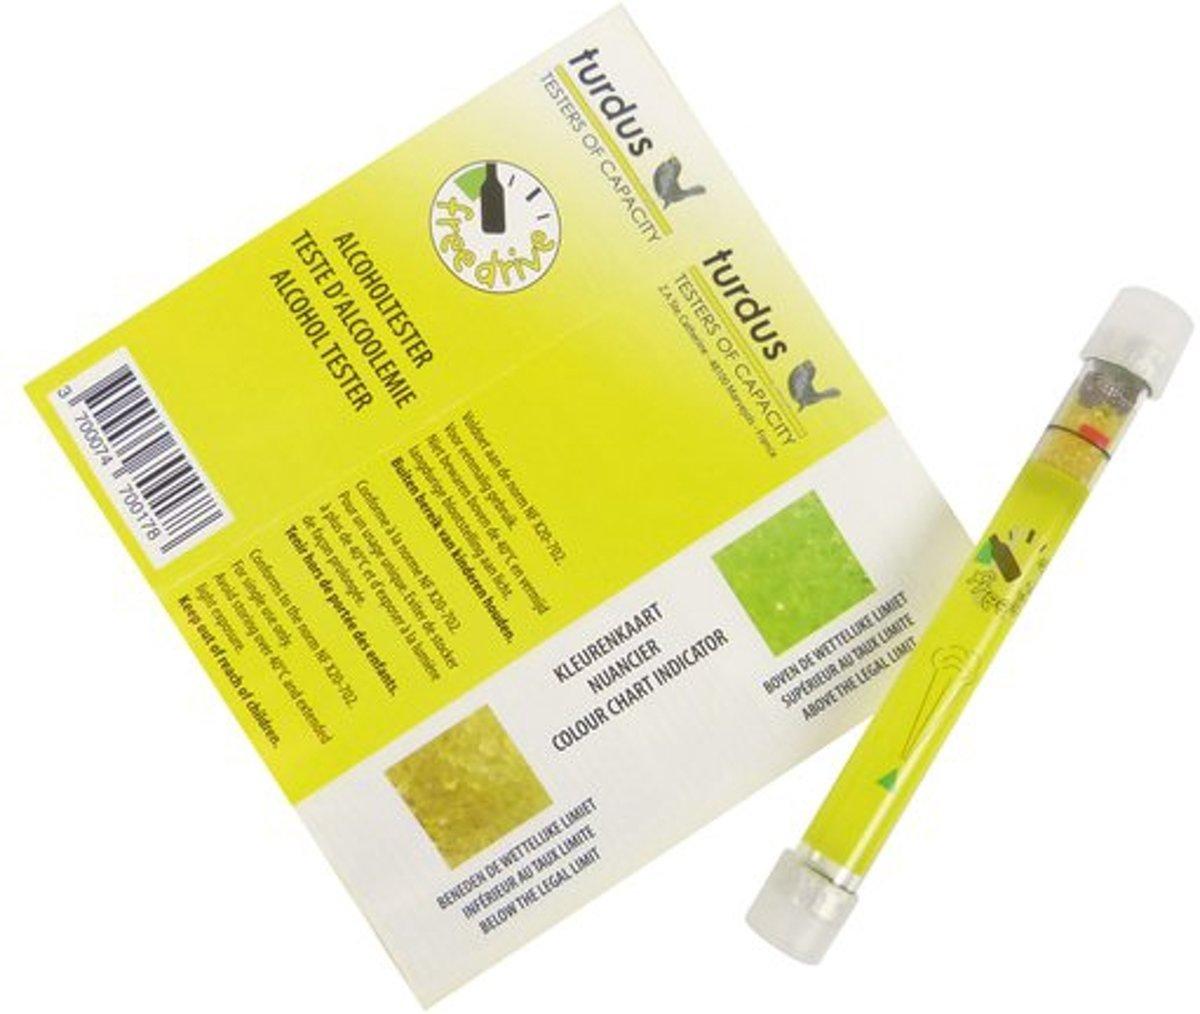 Foto van Voordeelpakket 10st Wegwerp Alcoholtester - Alcohol Ademtester - Alcohol Tester met NF-Keurmerk - 10 Stuks